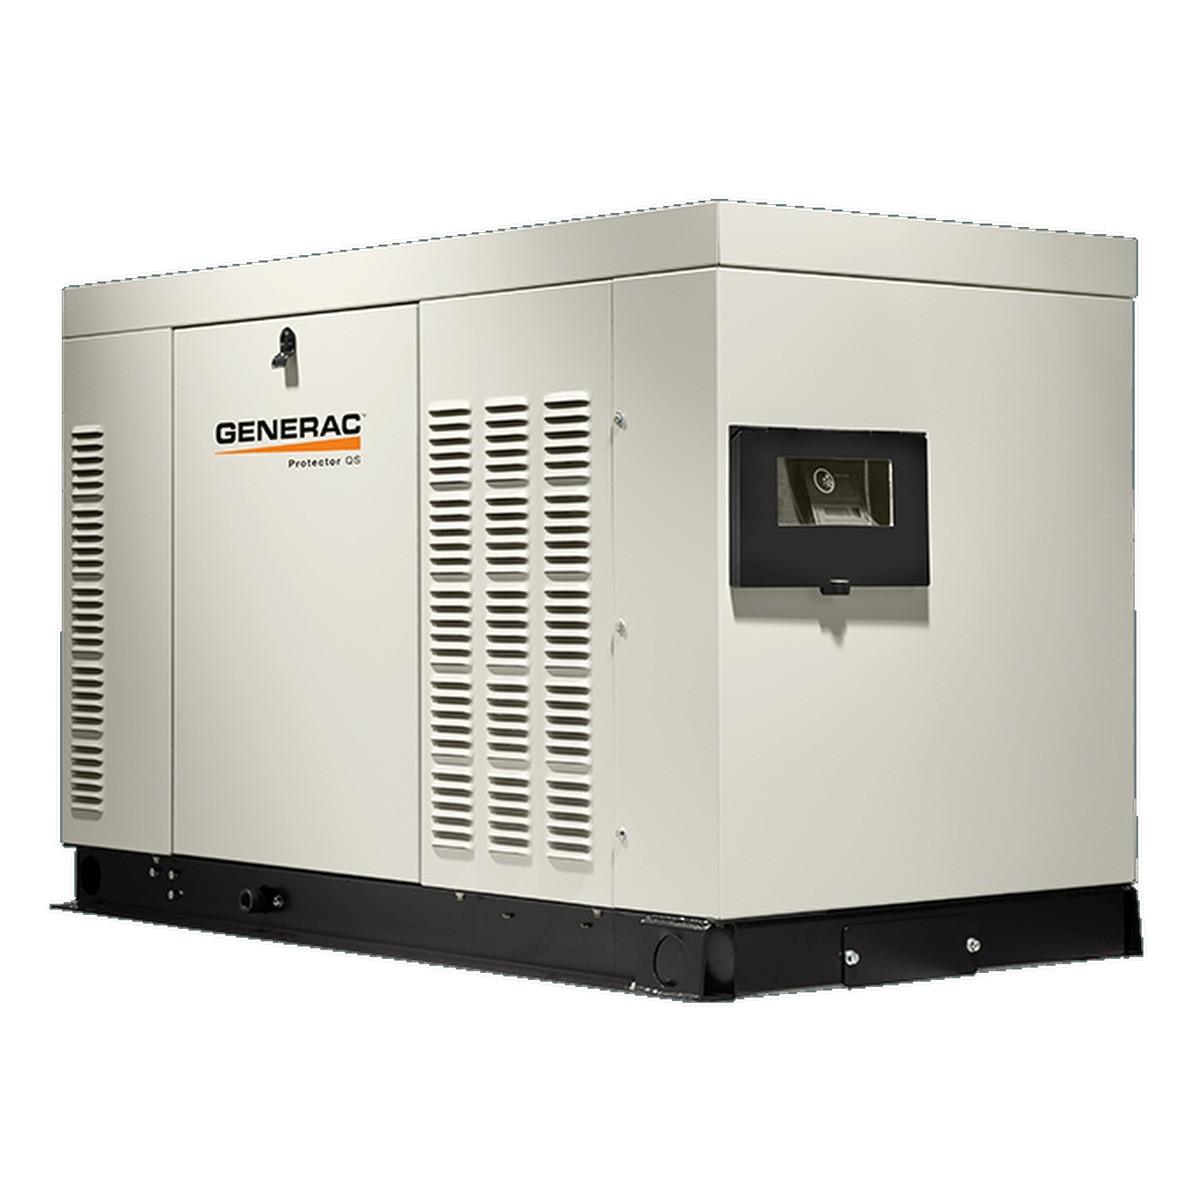 small resolution of generac protector series rg03015 30kw generator rh apelectric com generac transfer switch wiring diagram generac transfer switch wiring diagram